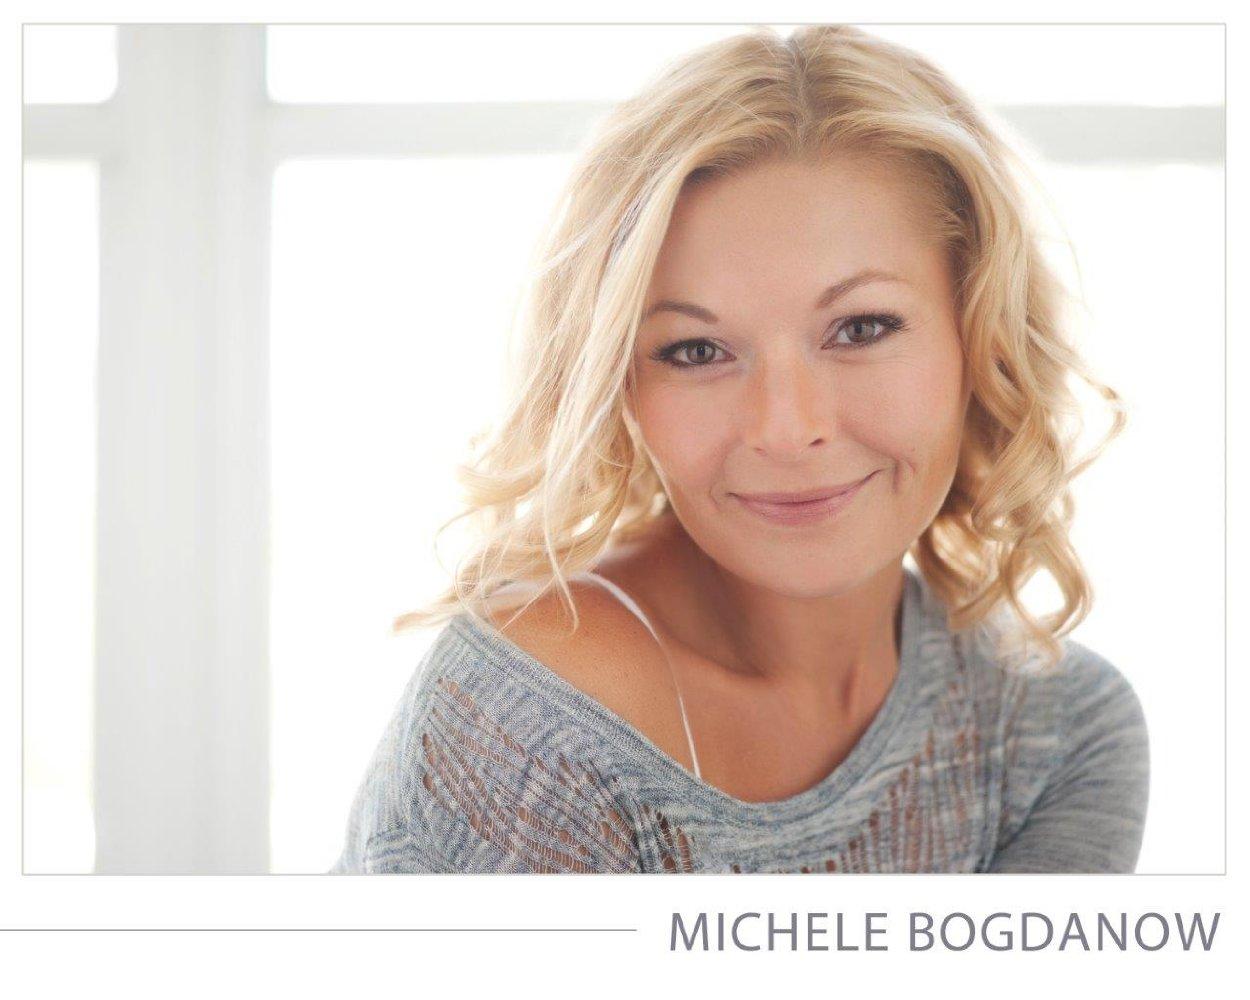 Michele Bogdanow